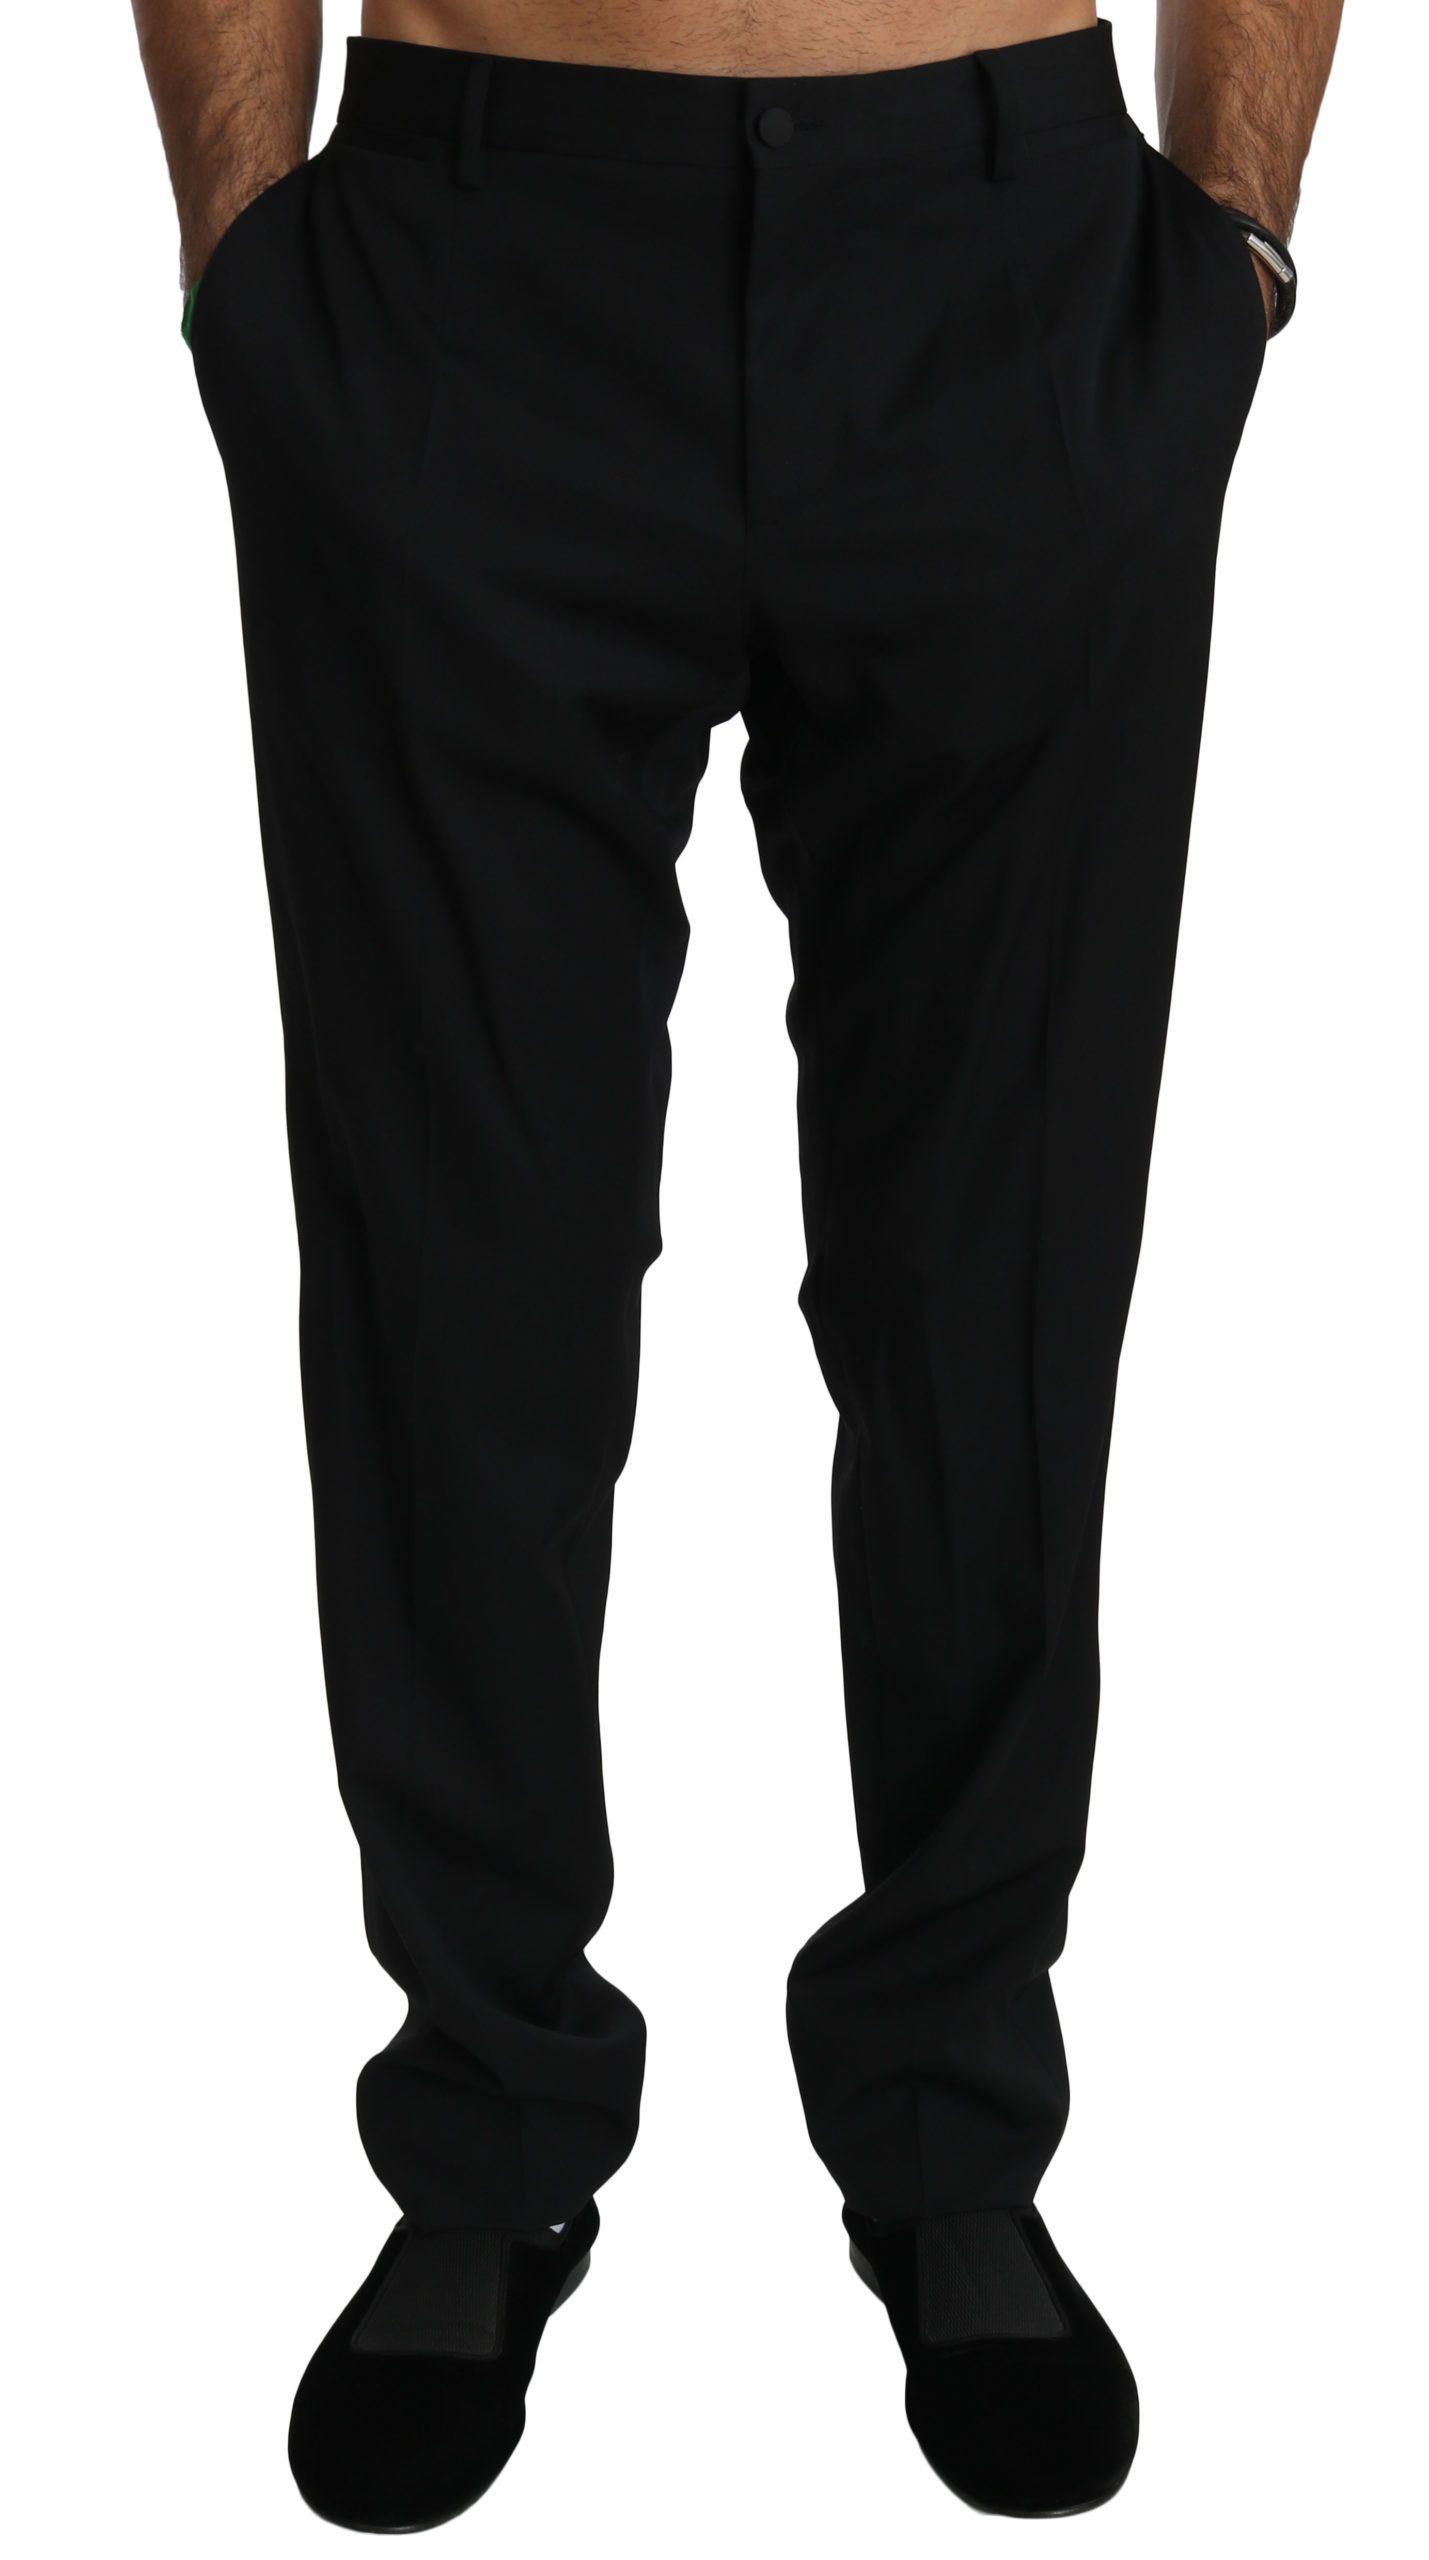 Dolce & Gabbana Men's Slim Formal Wool Trouser Black PAN70757 - IT52 | XL